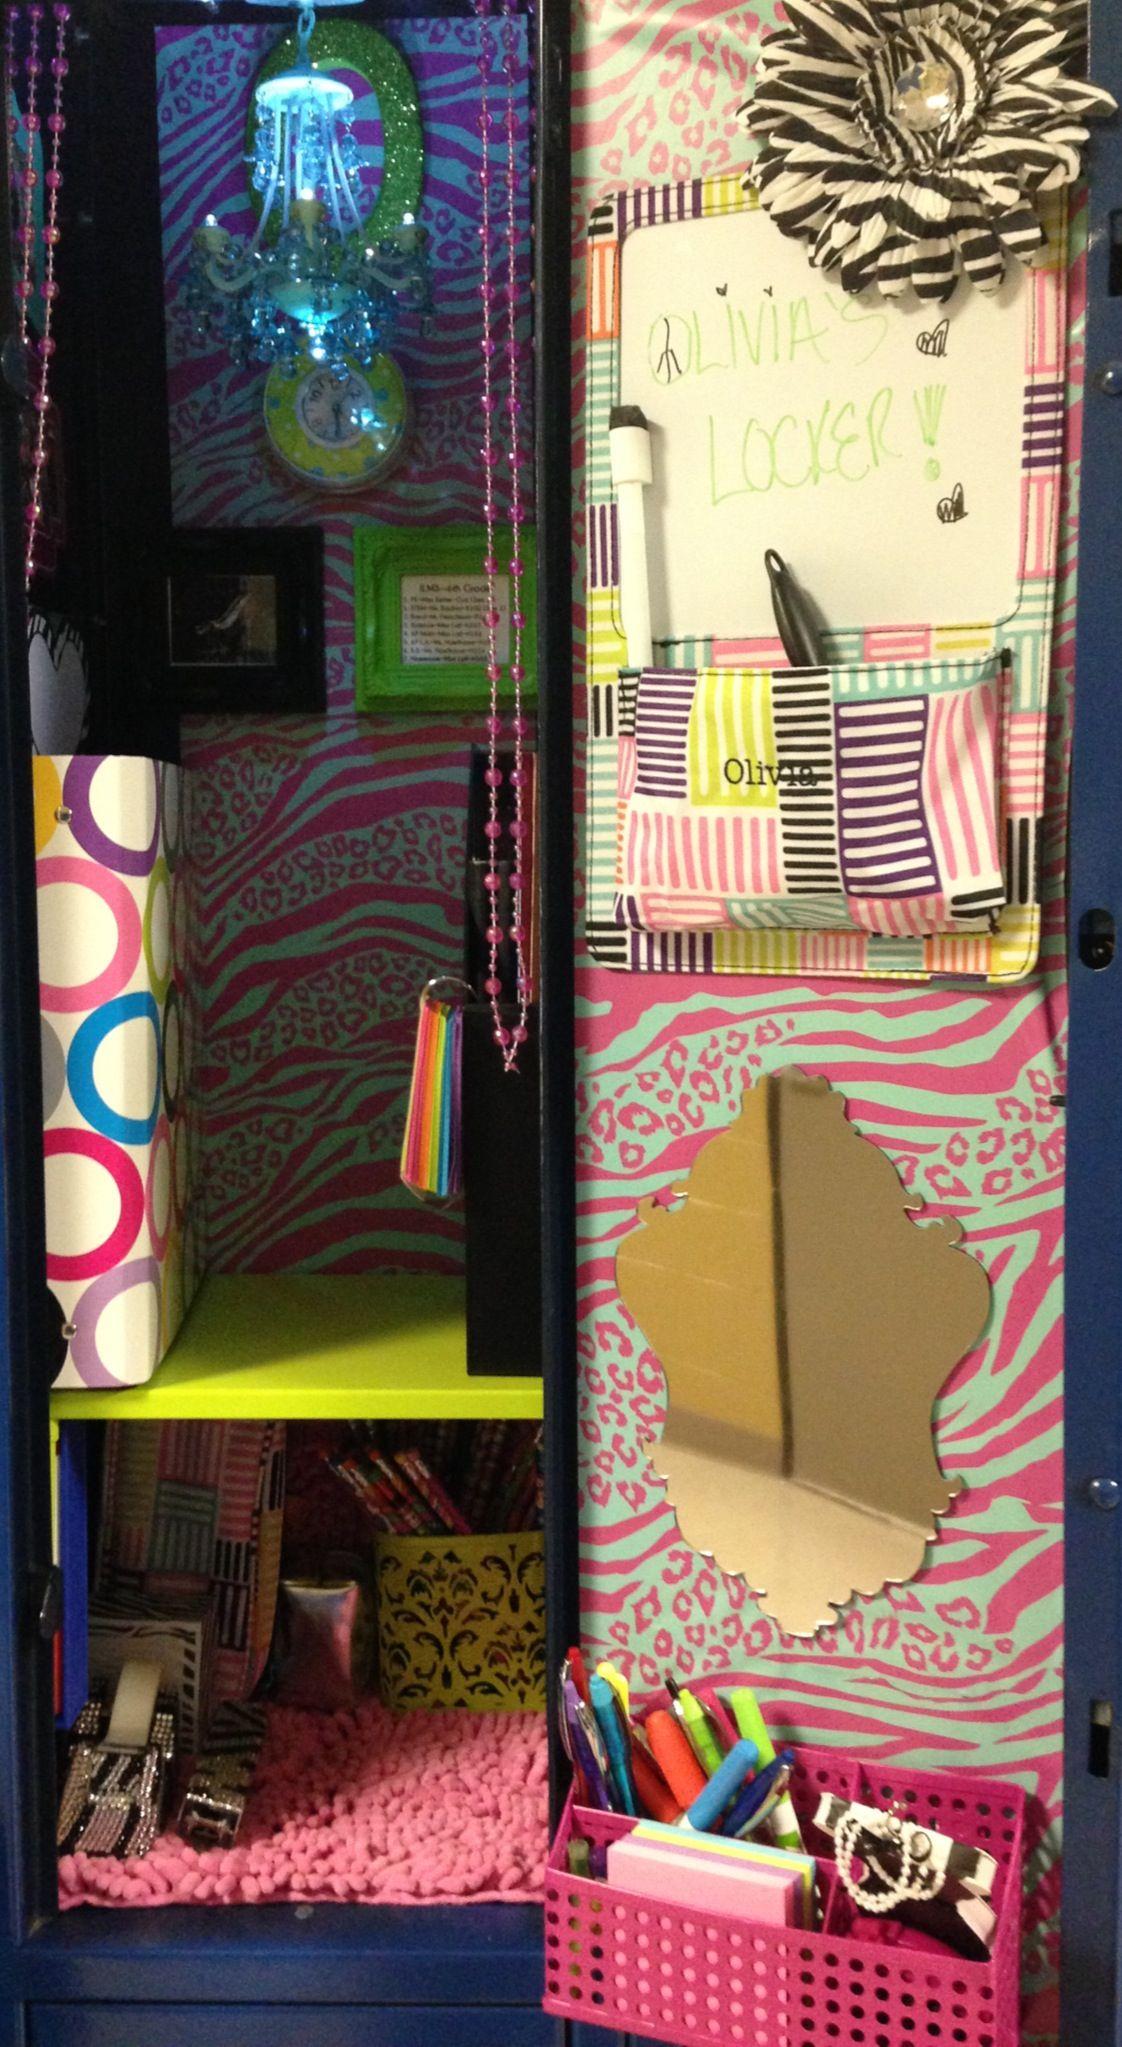 Adesivo De Unha Infantil Passo A Passo ~ Cute Locker Armário Pinterest Lockers, Locker ideas and School